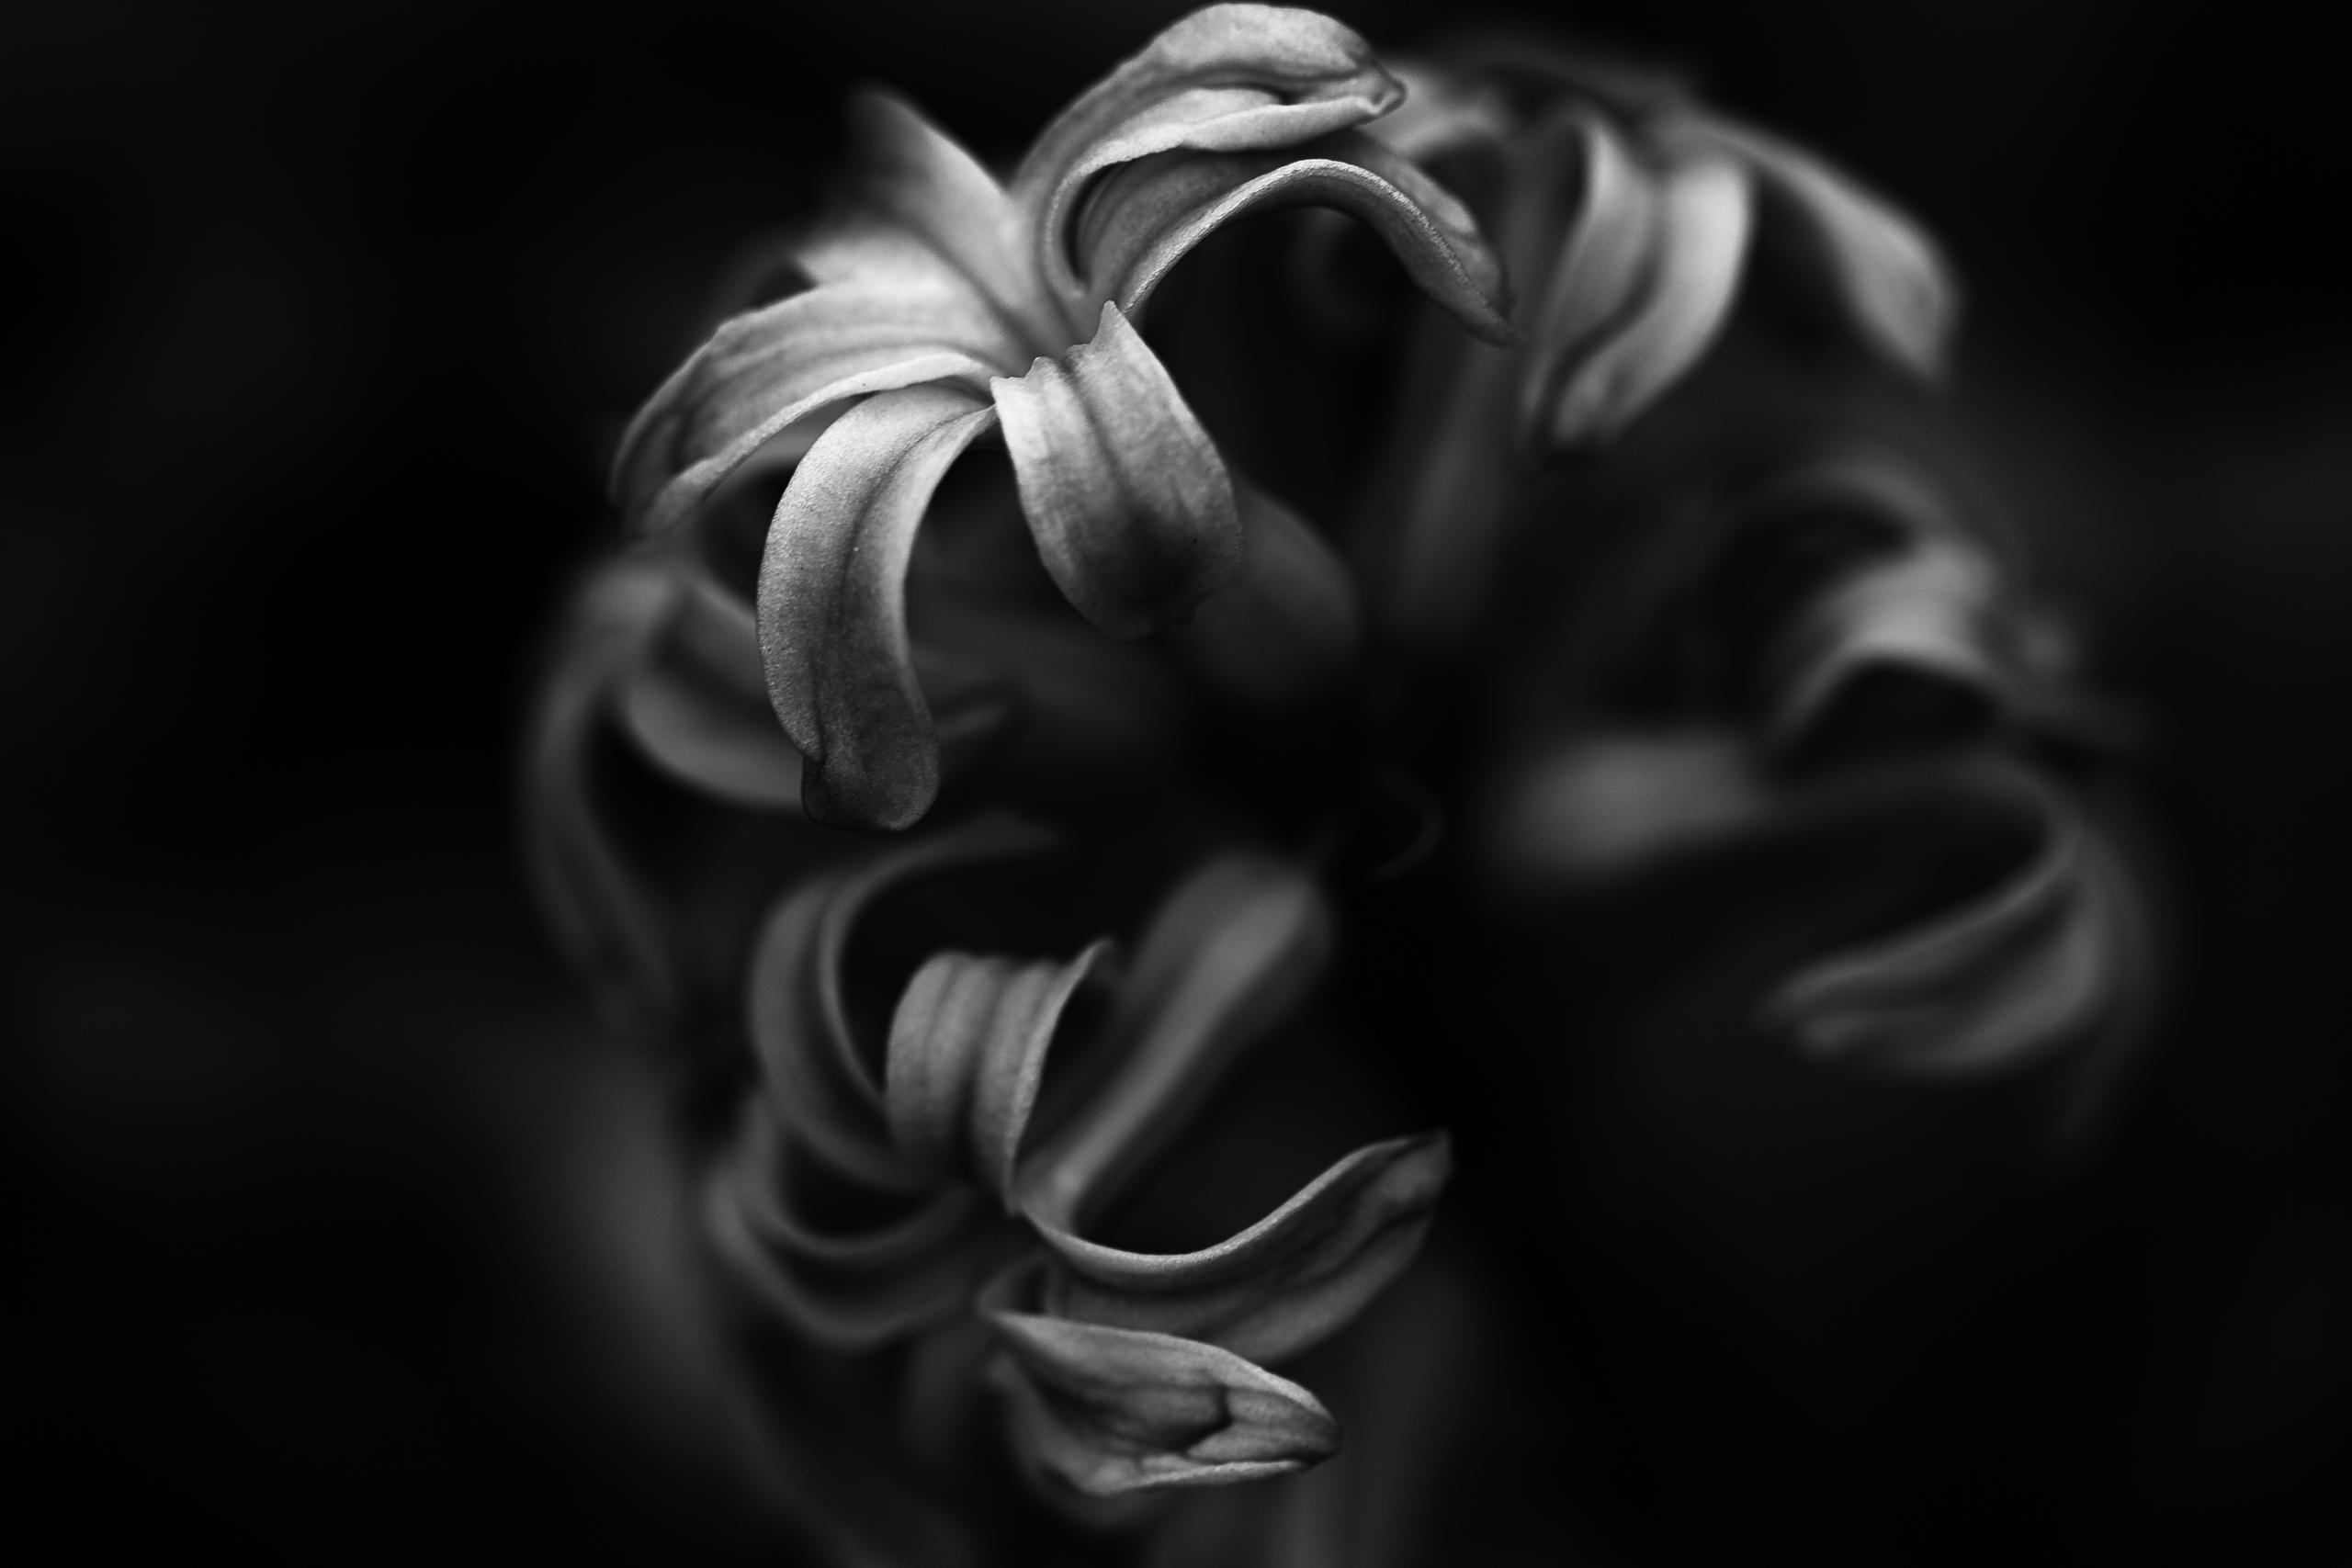 The Brooding Hyacinth Greg Molyneux Photography